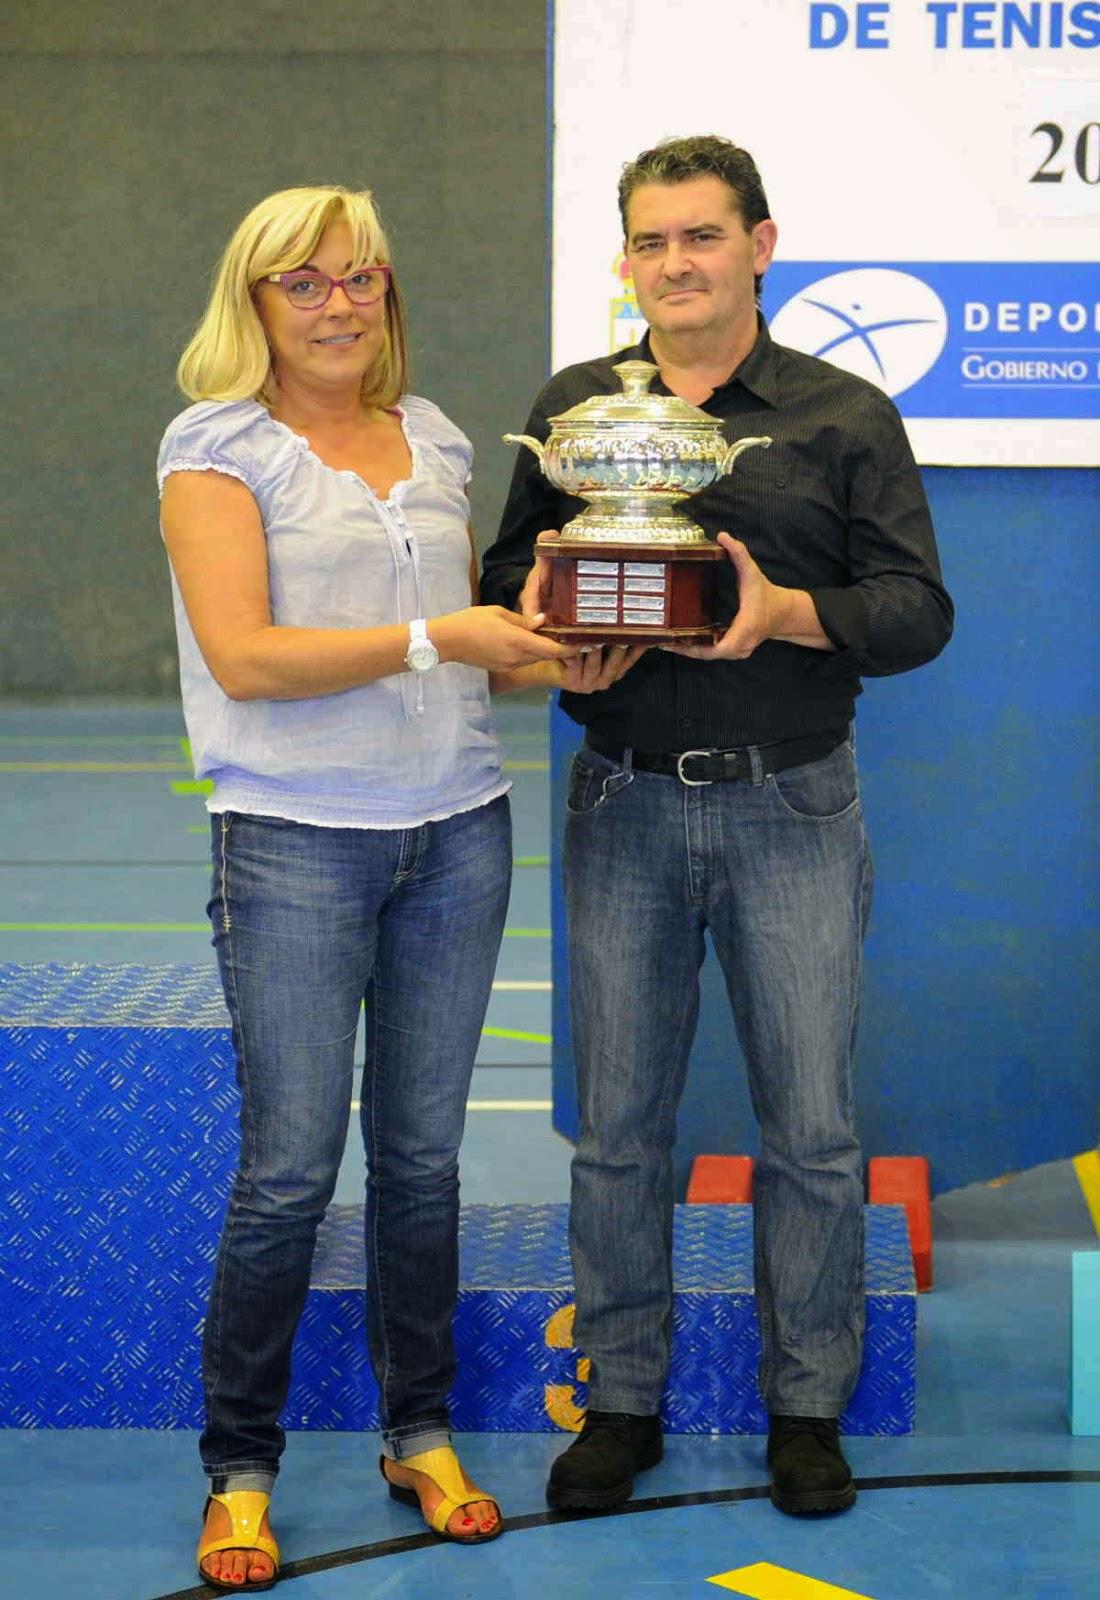 Avil s tenis de mesa julio 2014 - Aviles tenis de mesa ...